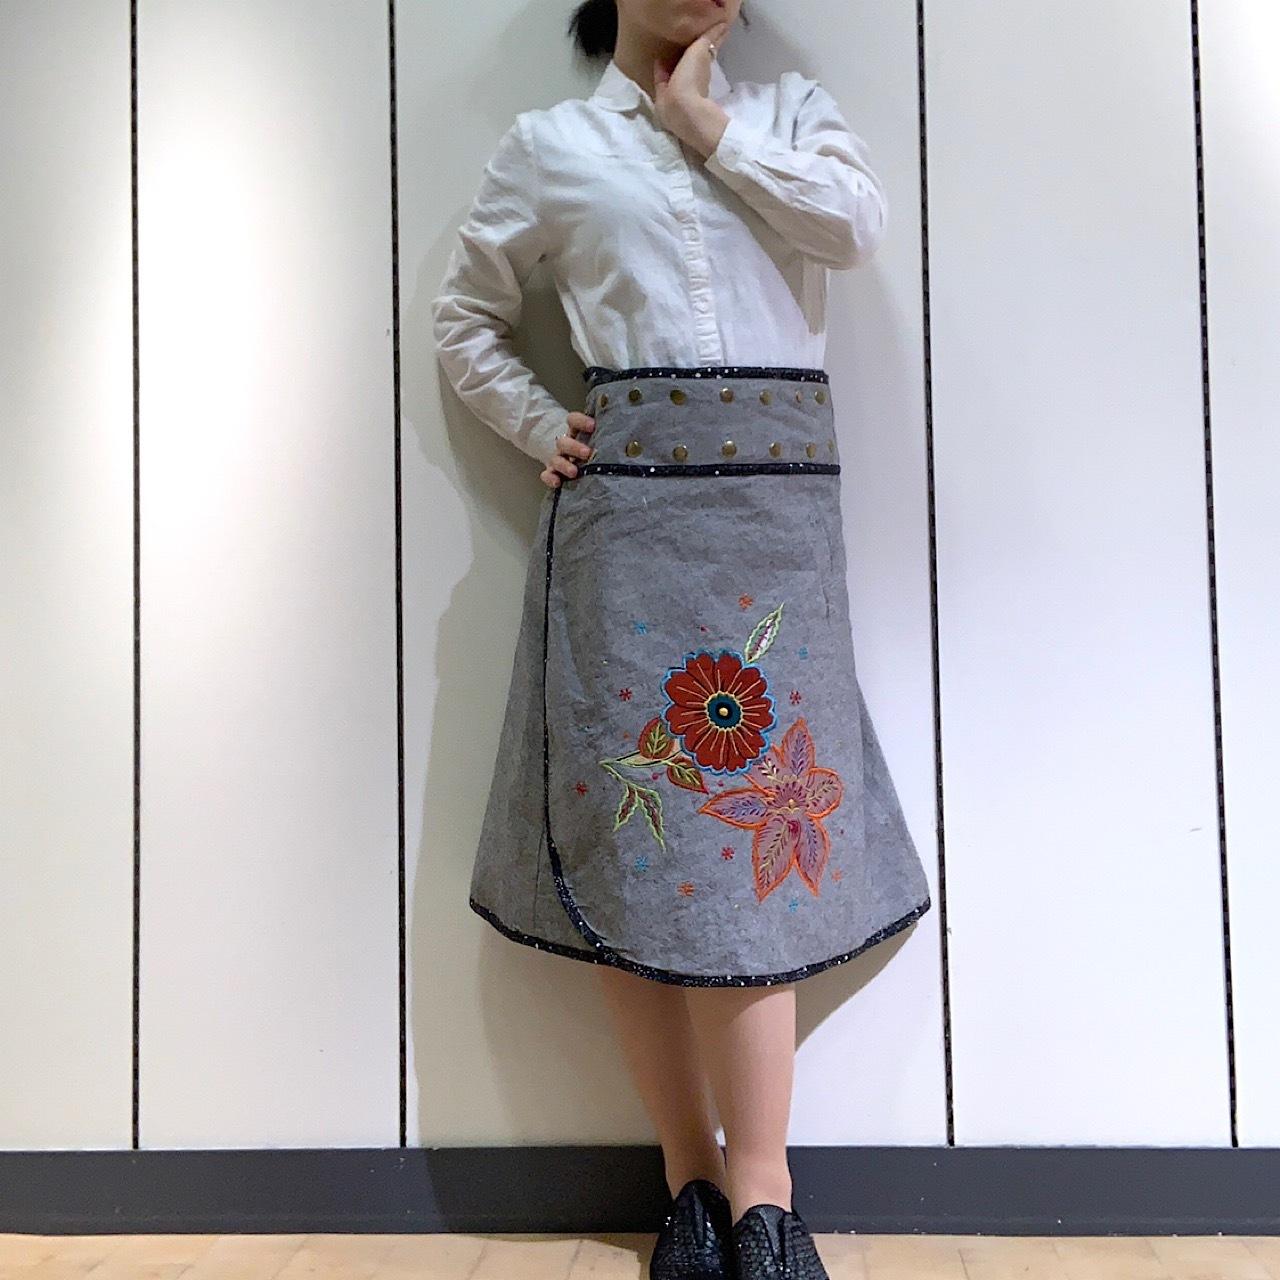 emcg-002 刺繍スナップスカート グレー・黒